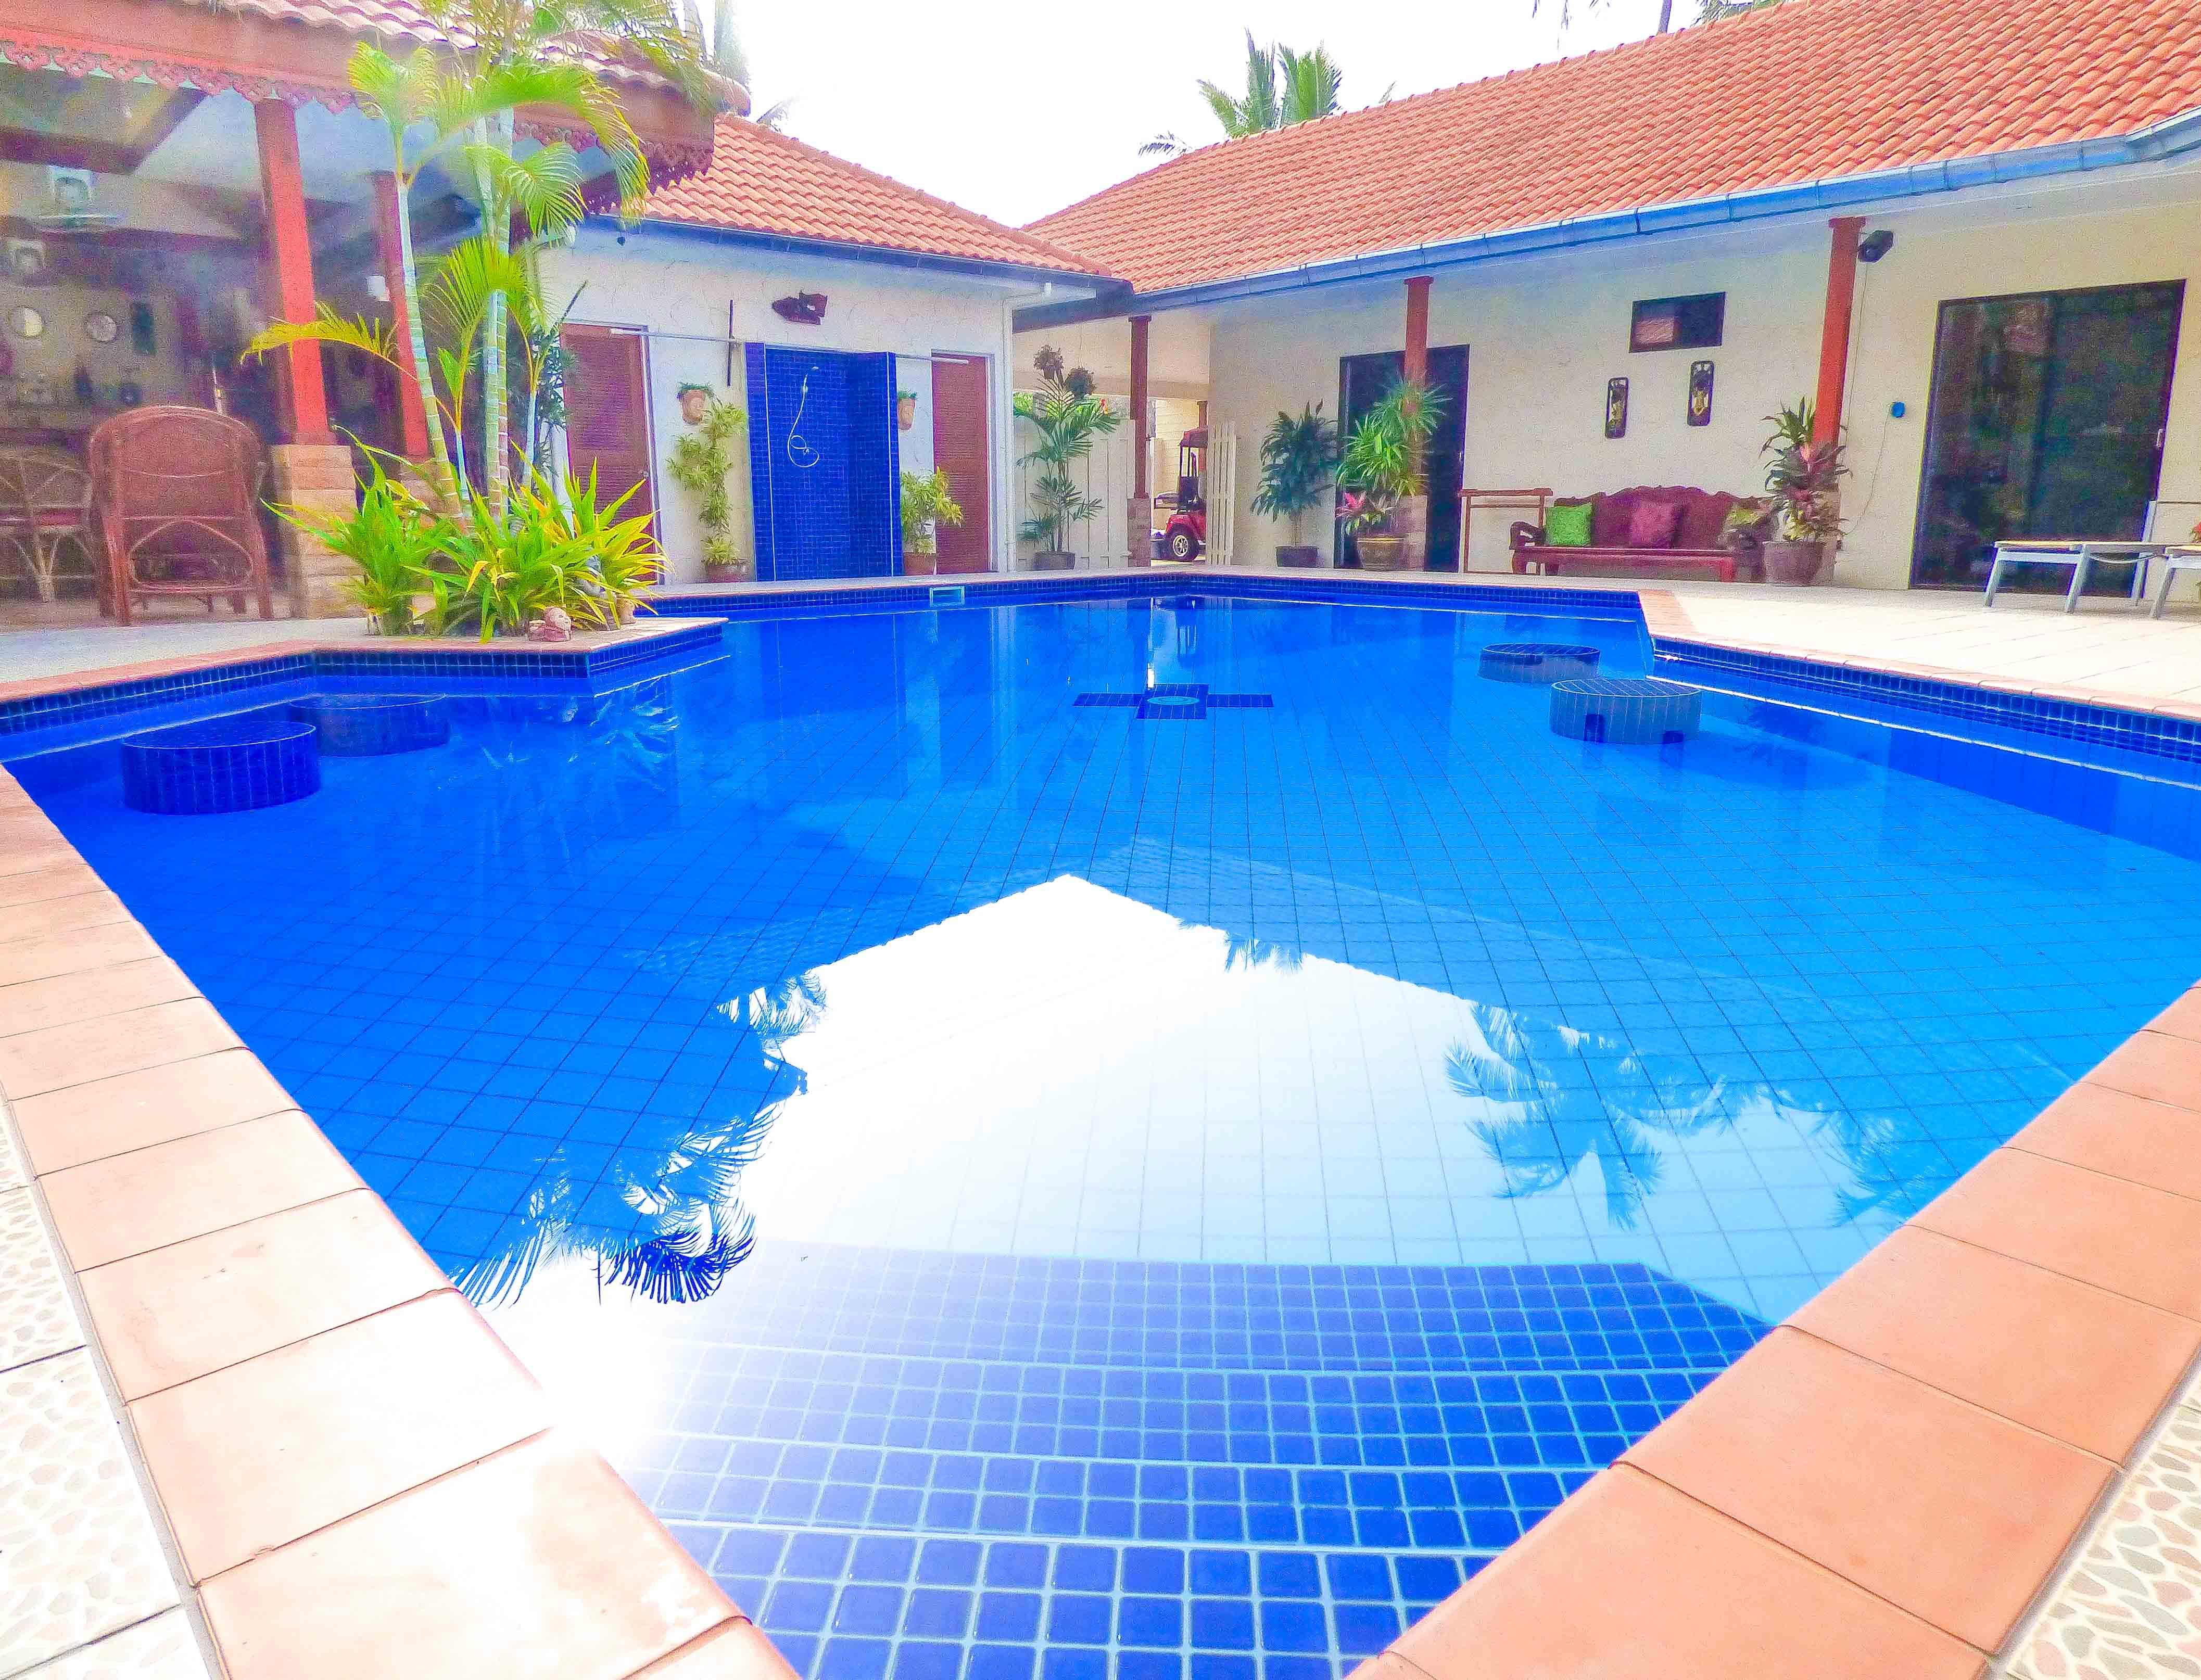 8 Bed Roomed Resort type Pool Villa 1.5 Km From Khao Kalok